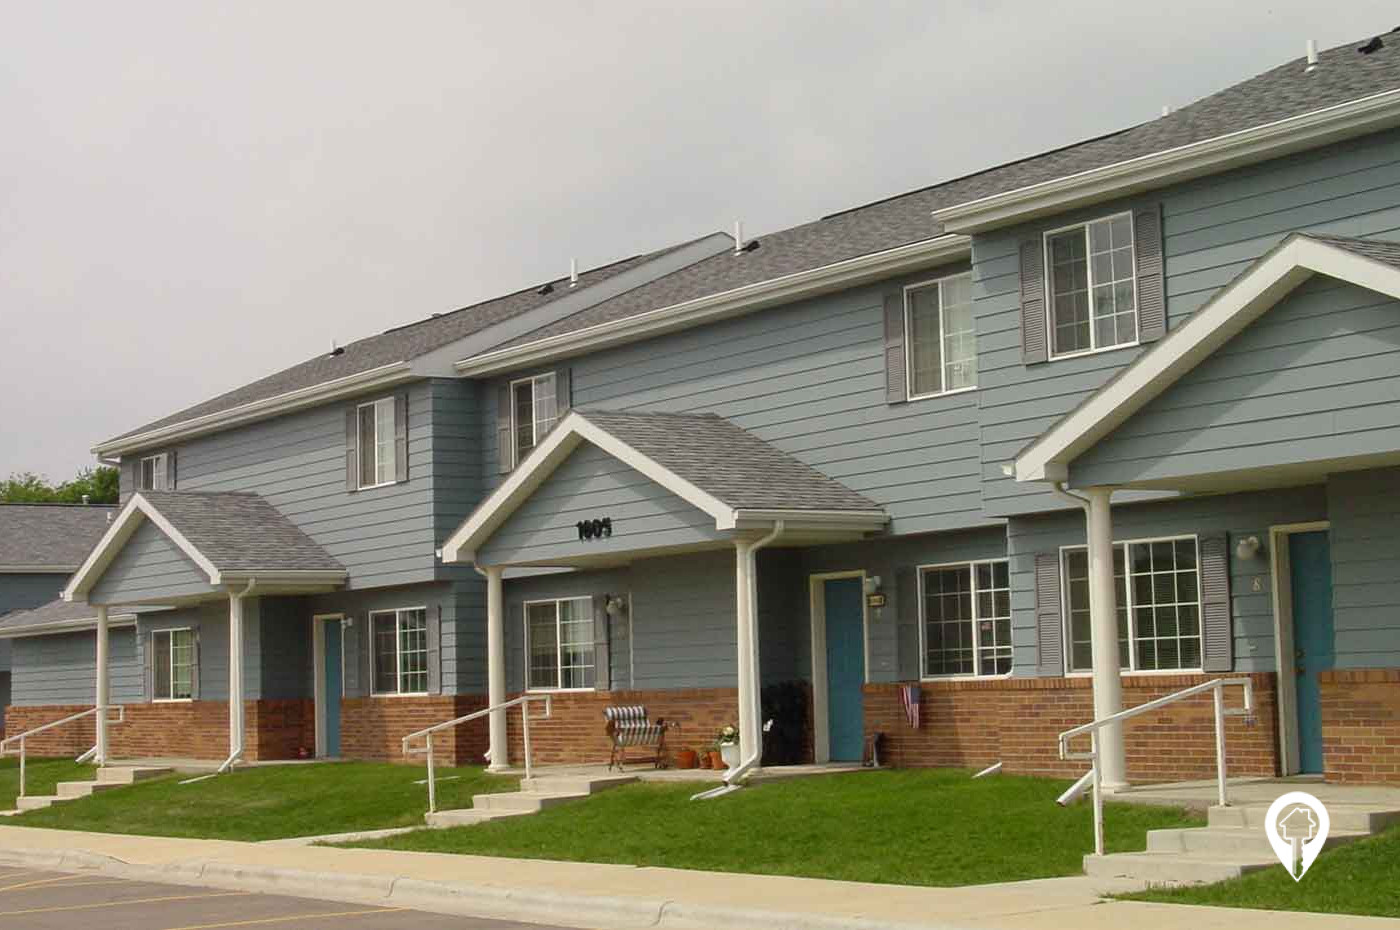 Southridge Apartments & Townhomes